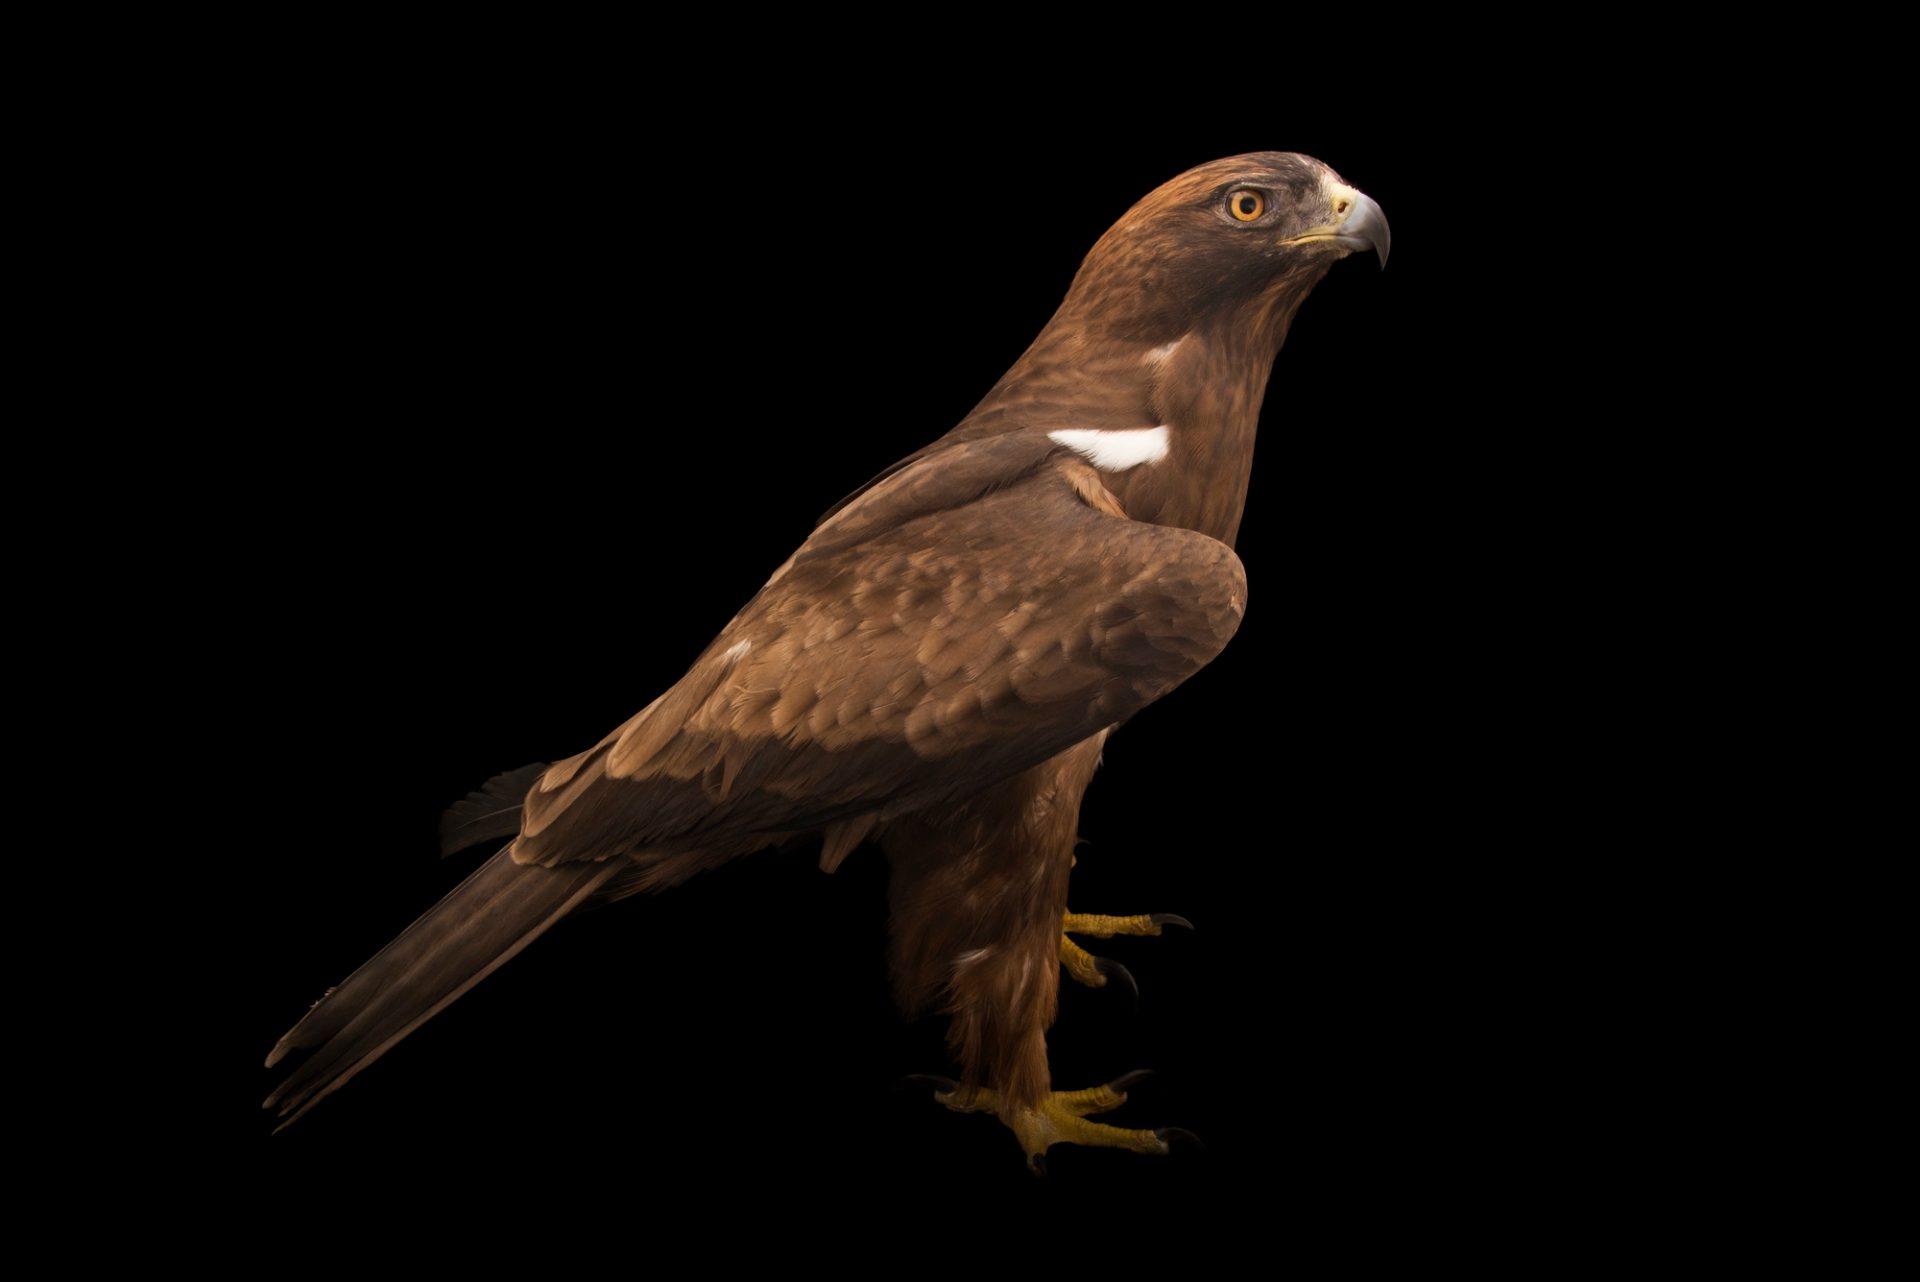 Photo: The melanistic (dark phase) of a booted eagle (Hieraaetus pennatus) at Sia, the Comanche Nation Ethno-Ornithological Initiative.